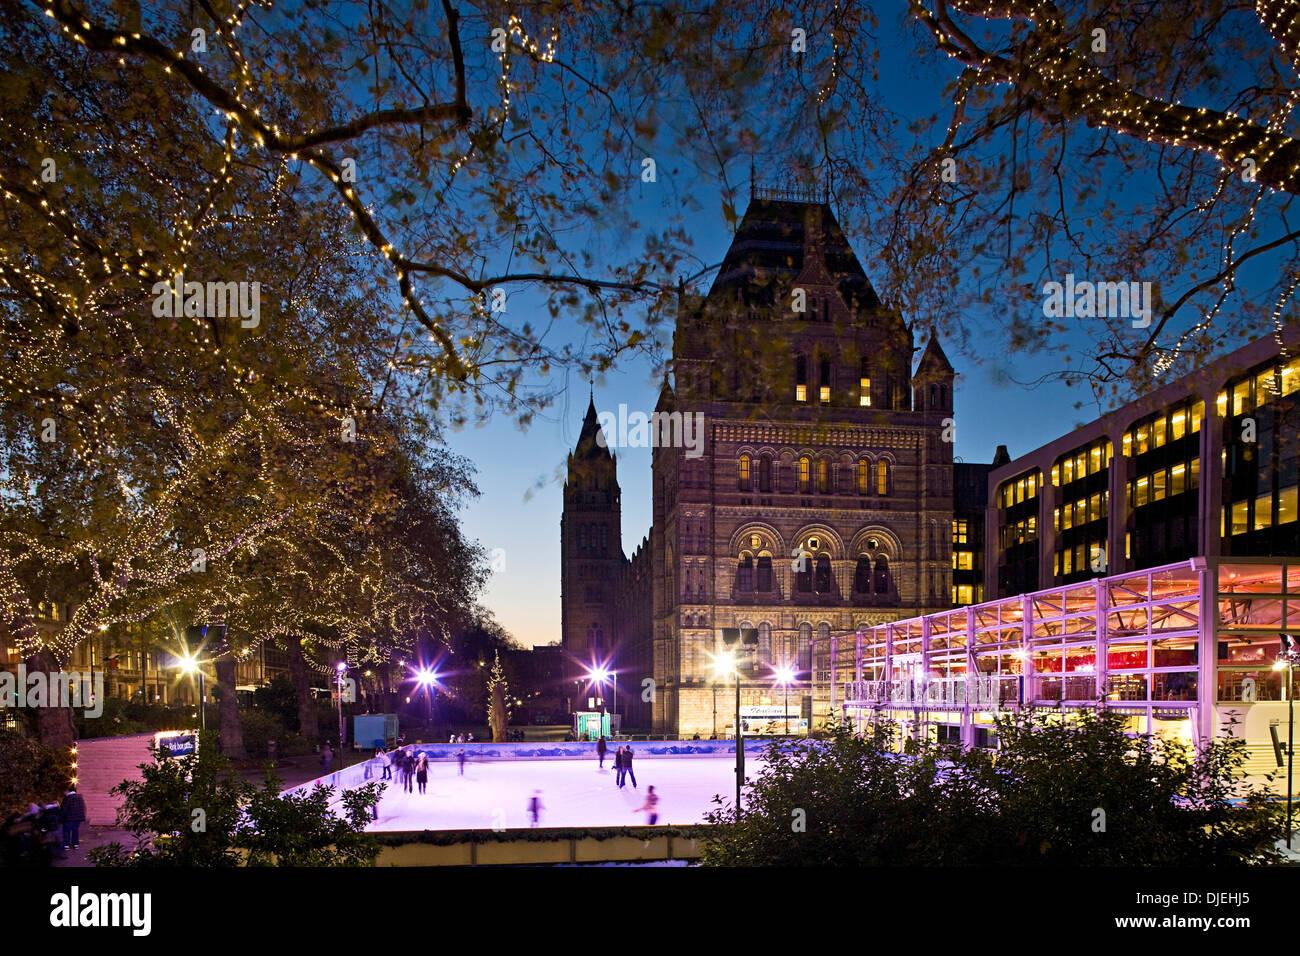 National History Museum, London, England, UK, Christmas, Shopping, Winter. Lagoon Images - Stock Image